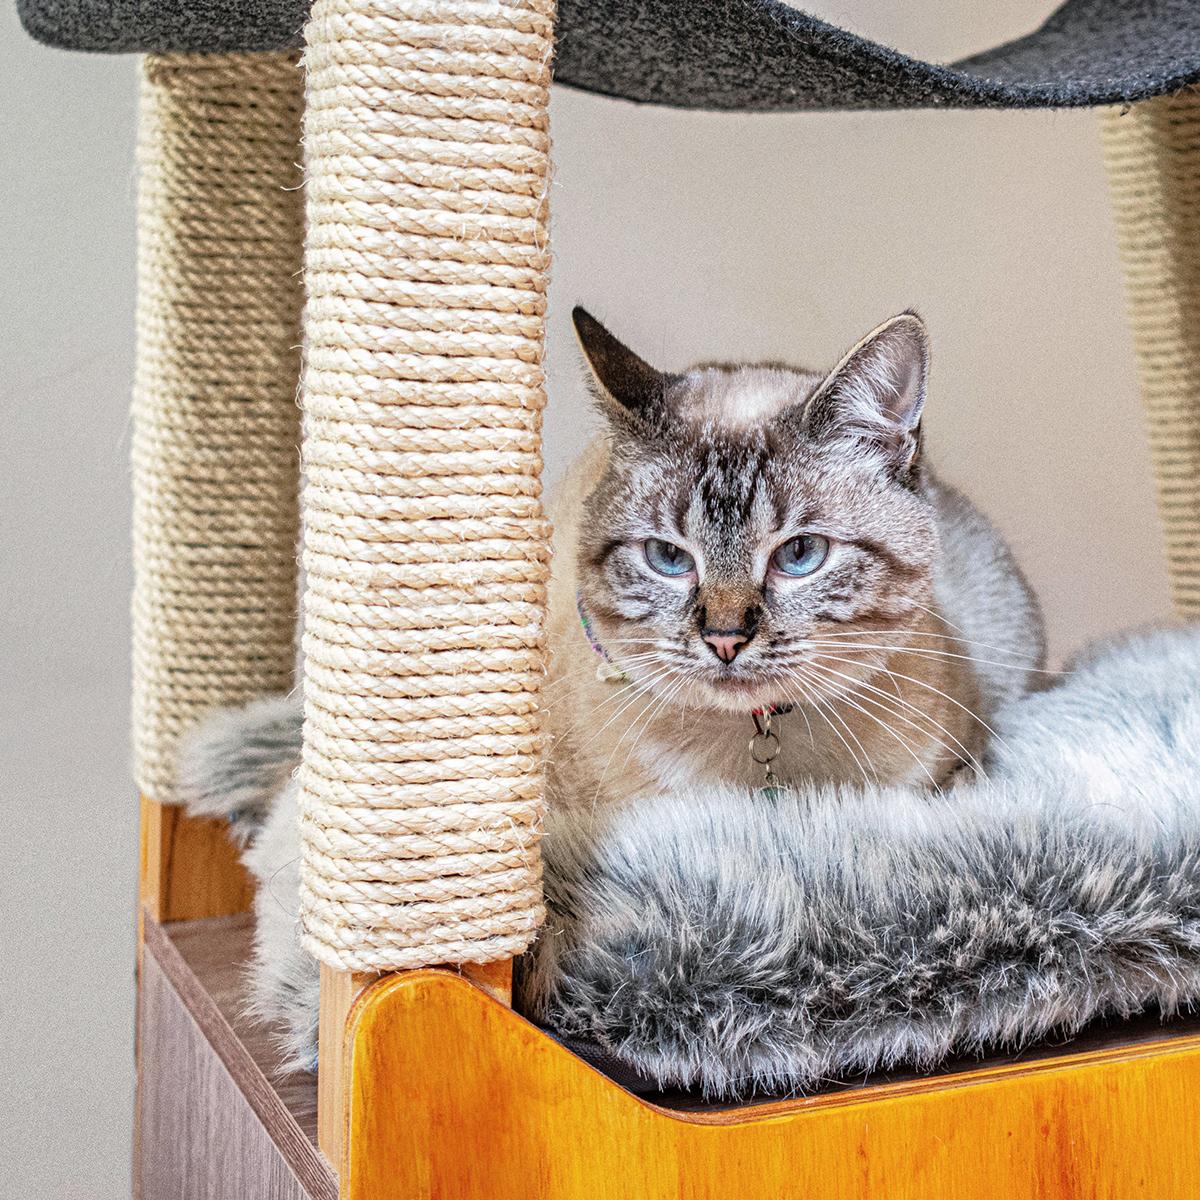 animals Cat Cat house Cat tree cats furniture industrial design  pet furniture pets product design